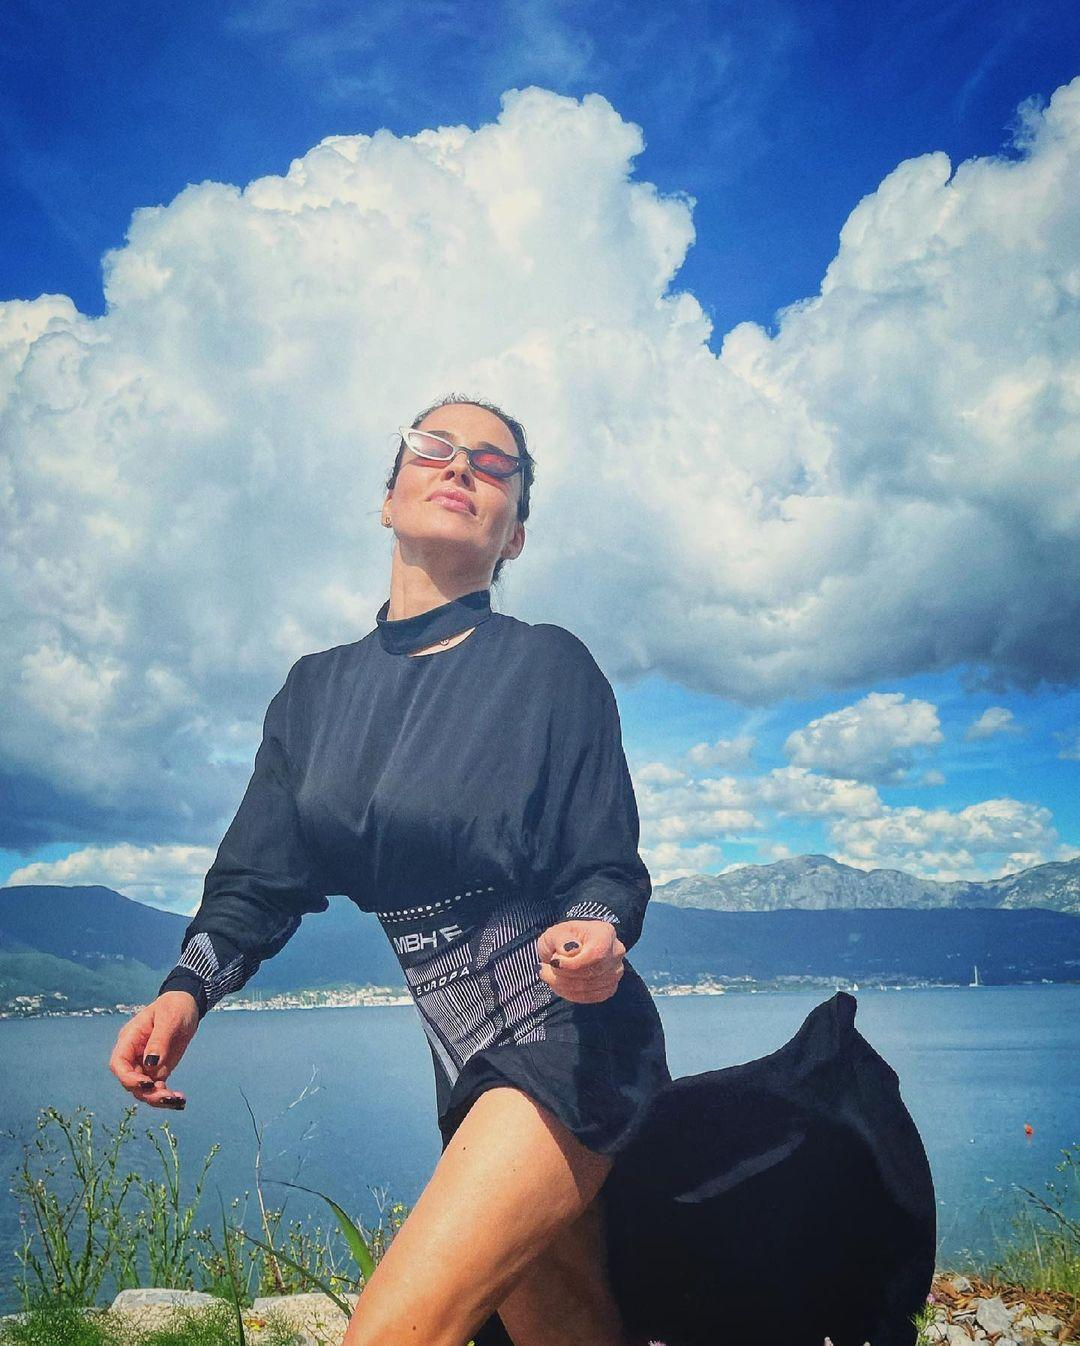 Даша Астафьева / фото instagram.com/da_astafieva